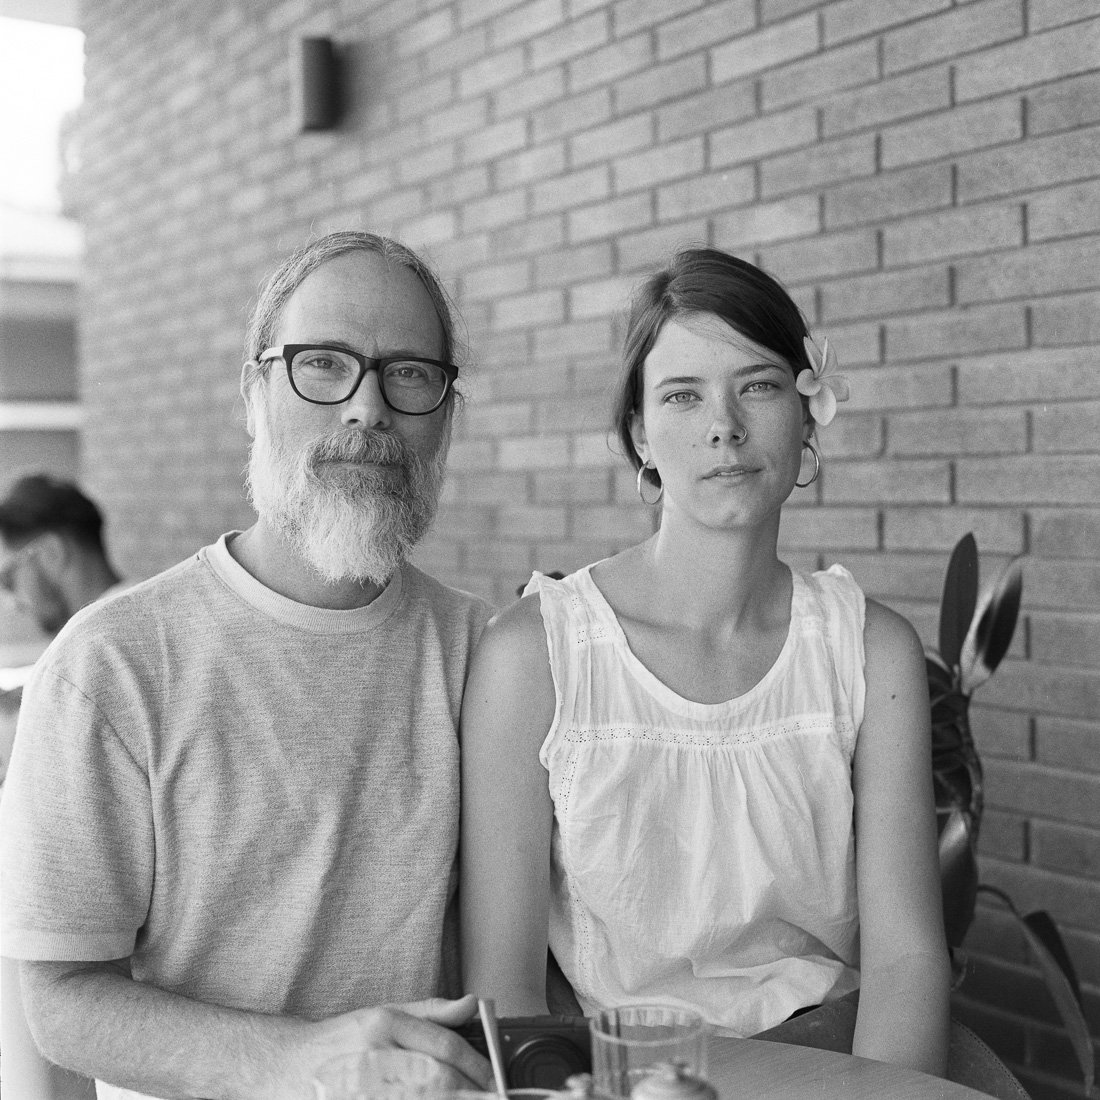 20190112 - Roll 270 - 010-Nick-Bedford,-Photographer-80mm F2.8, Black and White, Brisbane, Ilford HP5+, Medium Format, Rolleiflex 2.8D.jpg